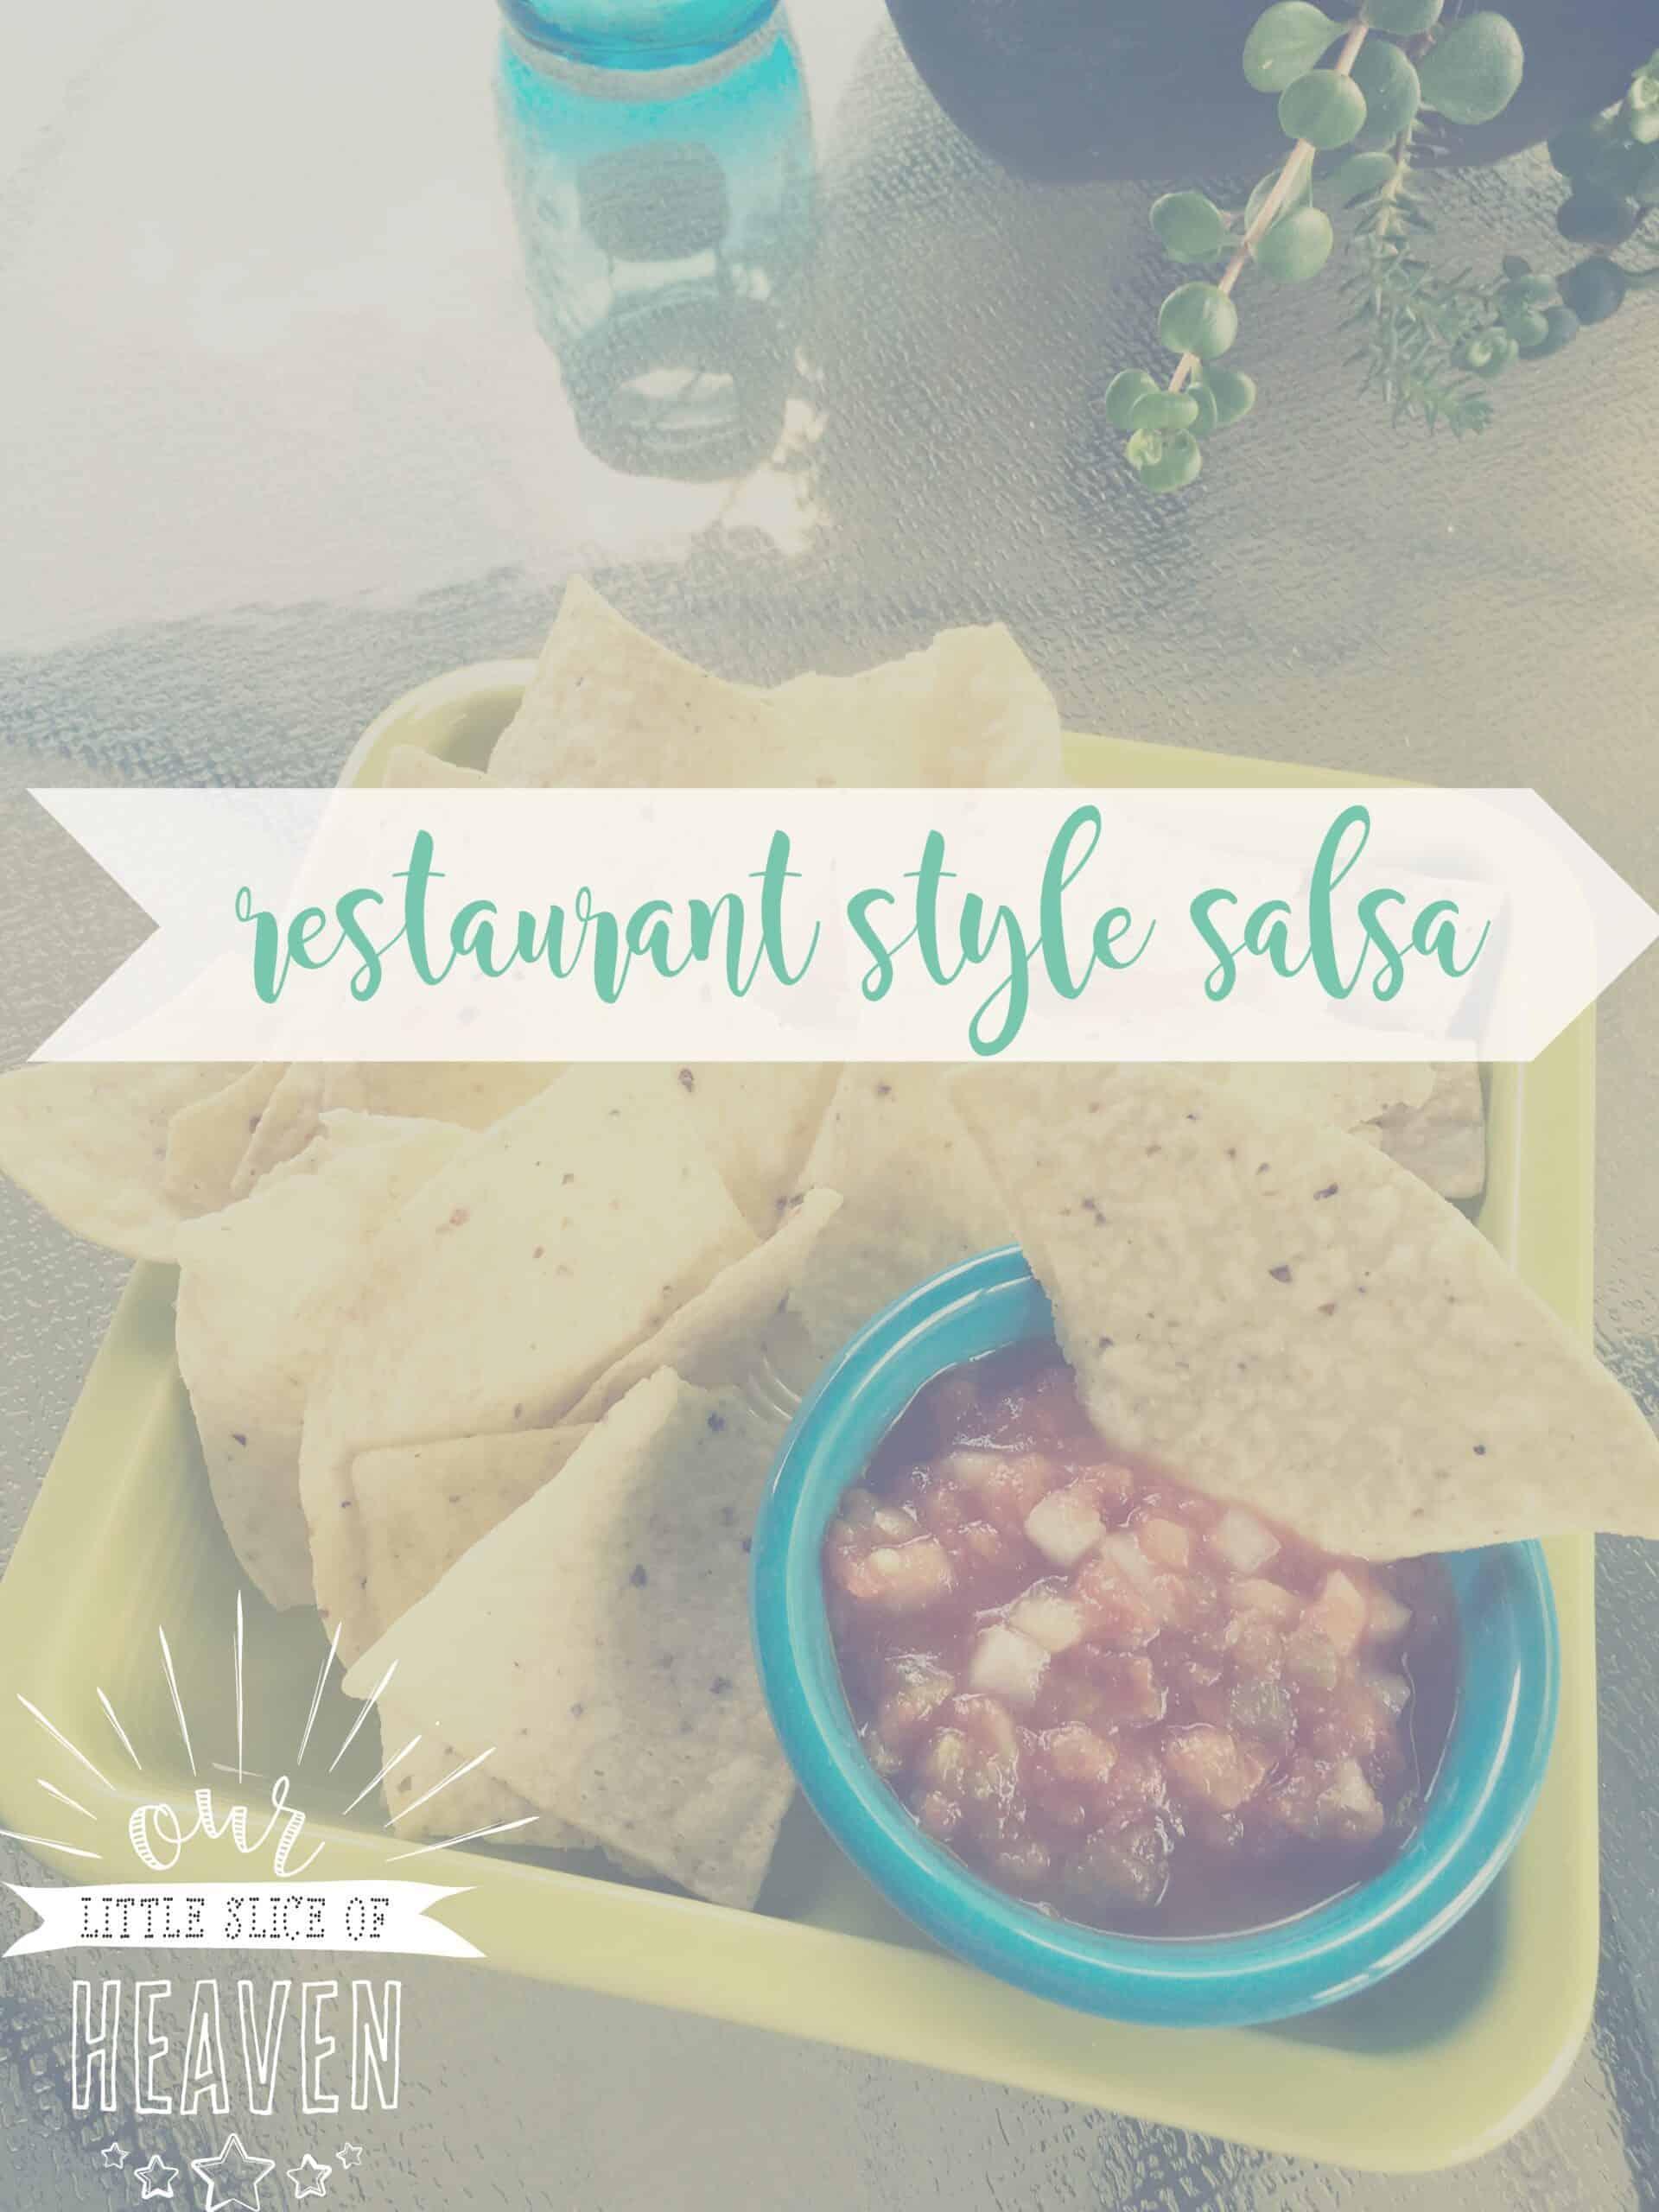 restaurant style salsa recipe cover